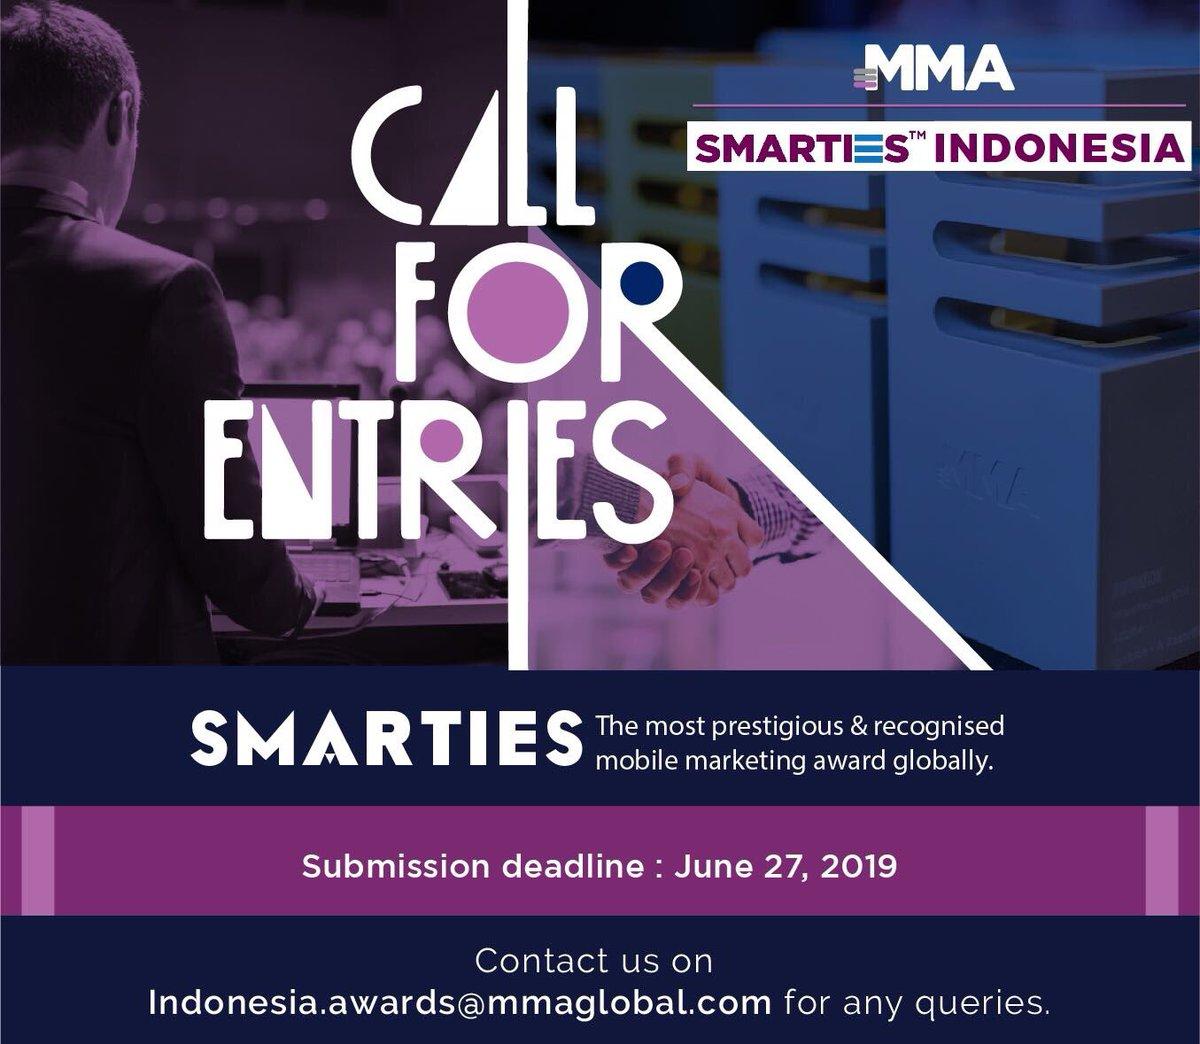 CALL FOR SMARTIES - MMA INDONESIA  Submission Deadline : 27/June 2019  #mmaindonesia #smartiesawards @MMA_APAC @MMAglobalpic.twitter.com/NIzTHviMWn